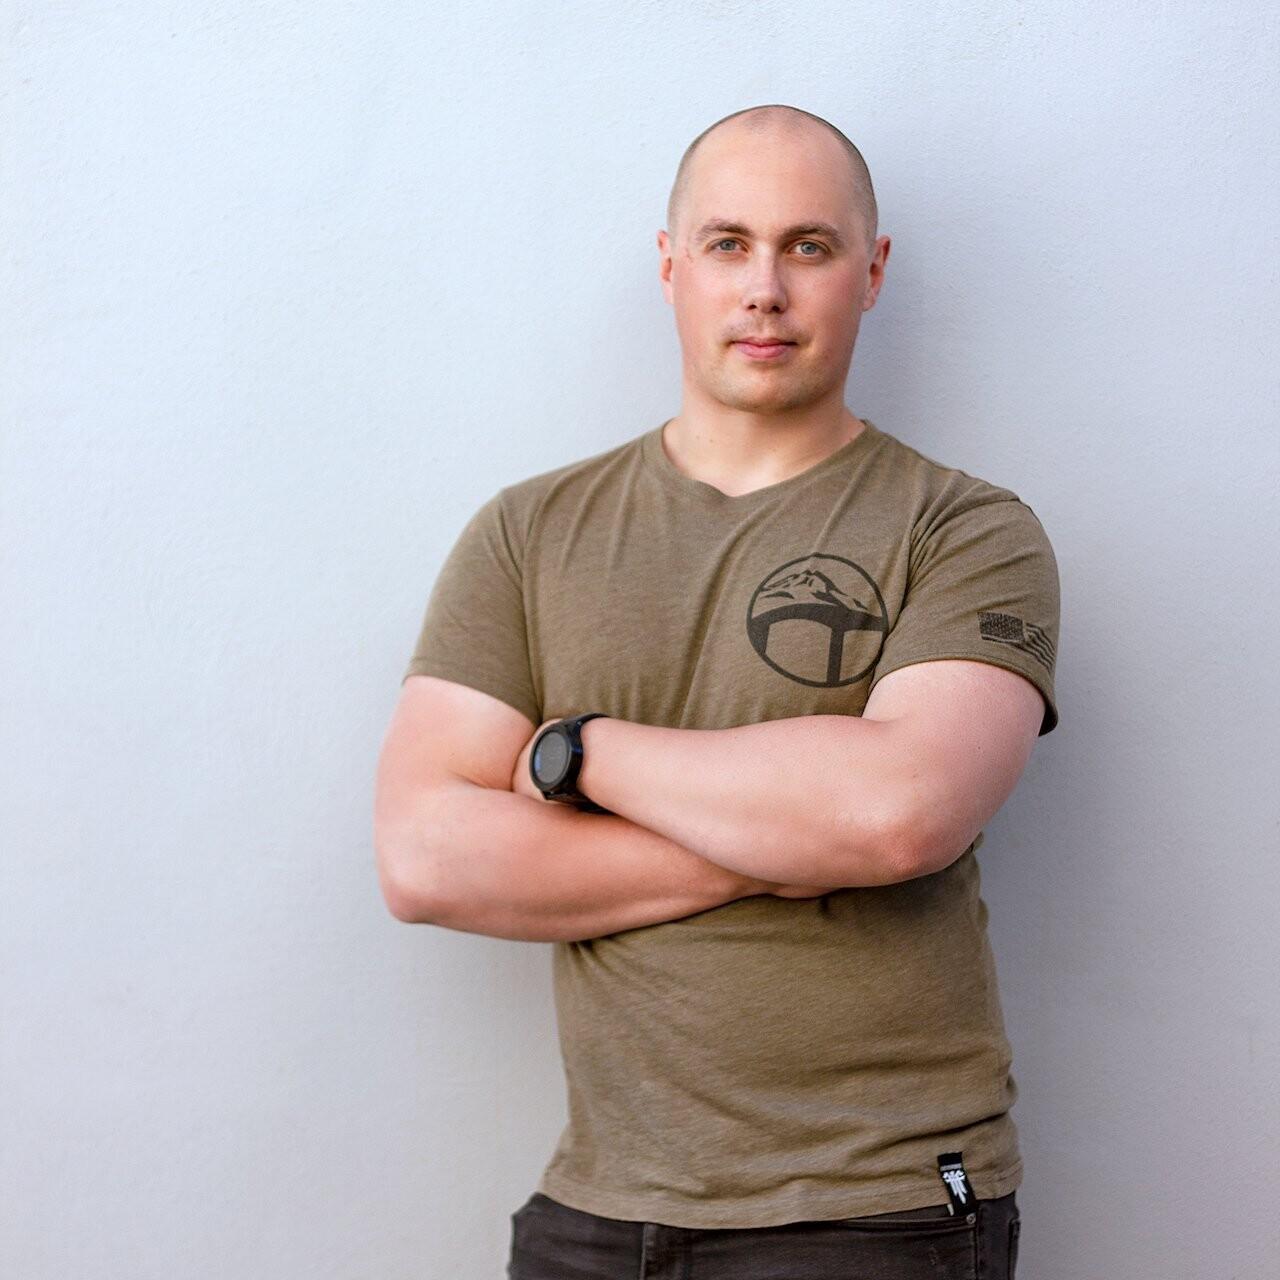 Dejan Gajsek